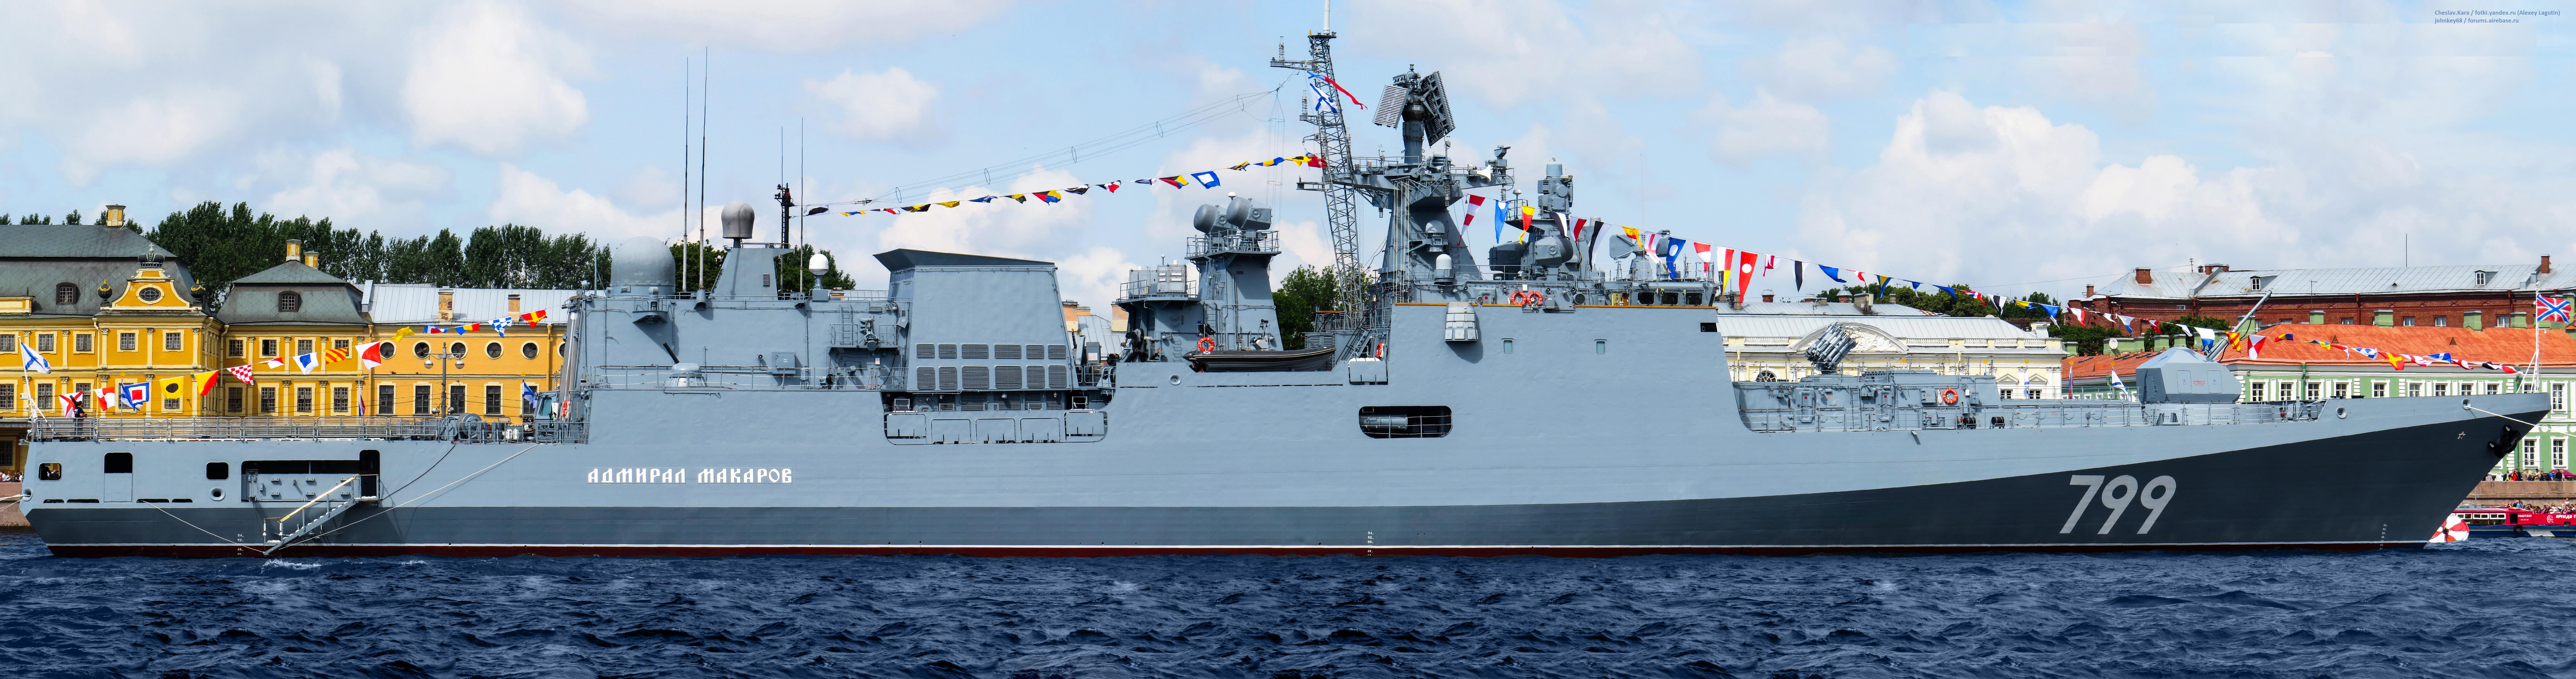 Адмирал Макаров на Неве _1 (HD)